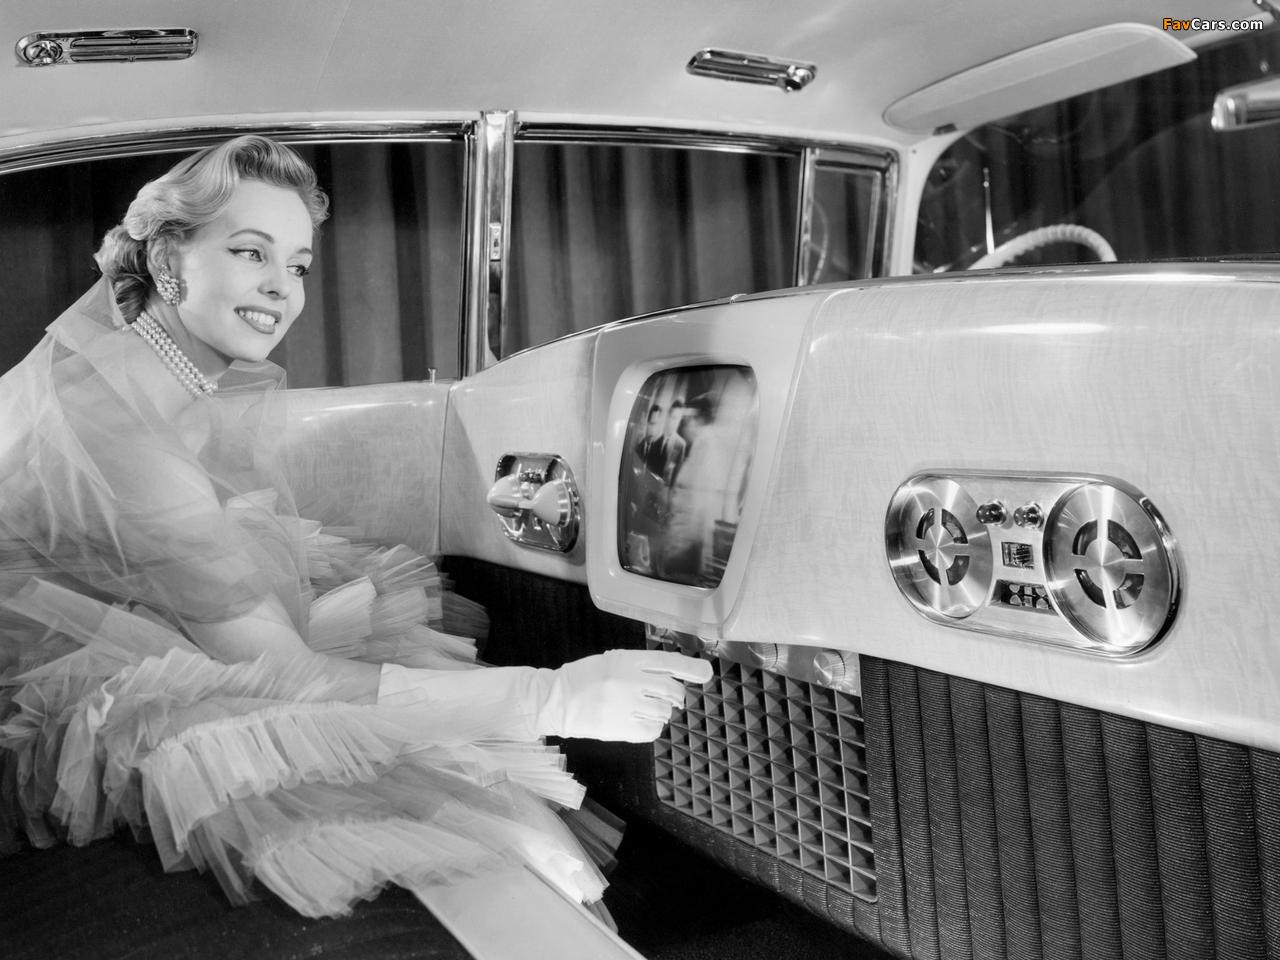 Cadillac Eldorado Brougham Dream Car 1955 wallpapers (1280 x 960)